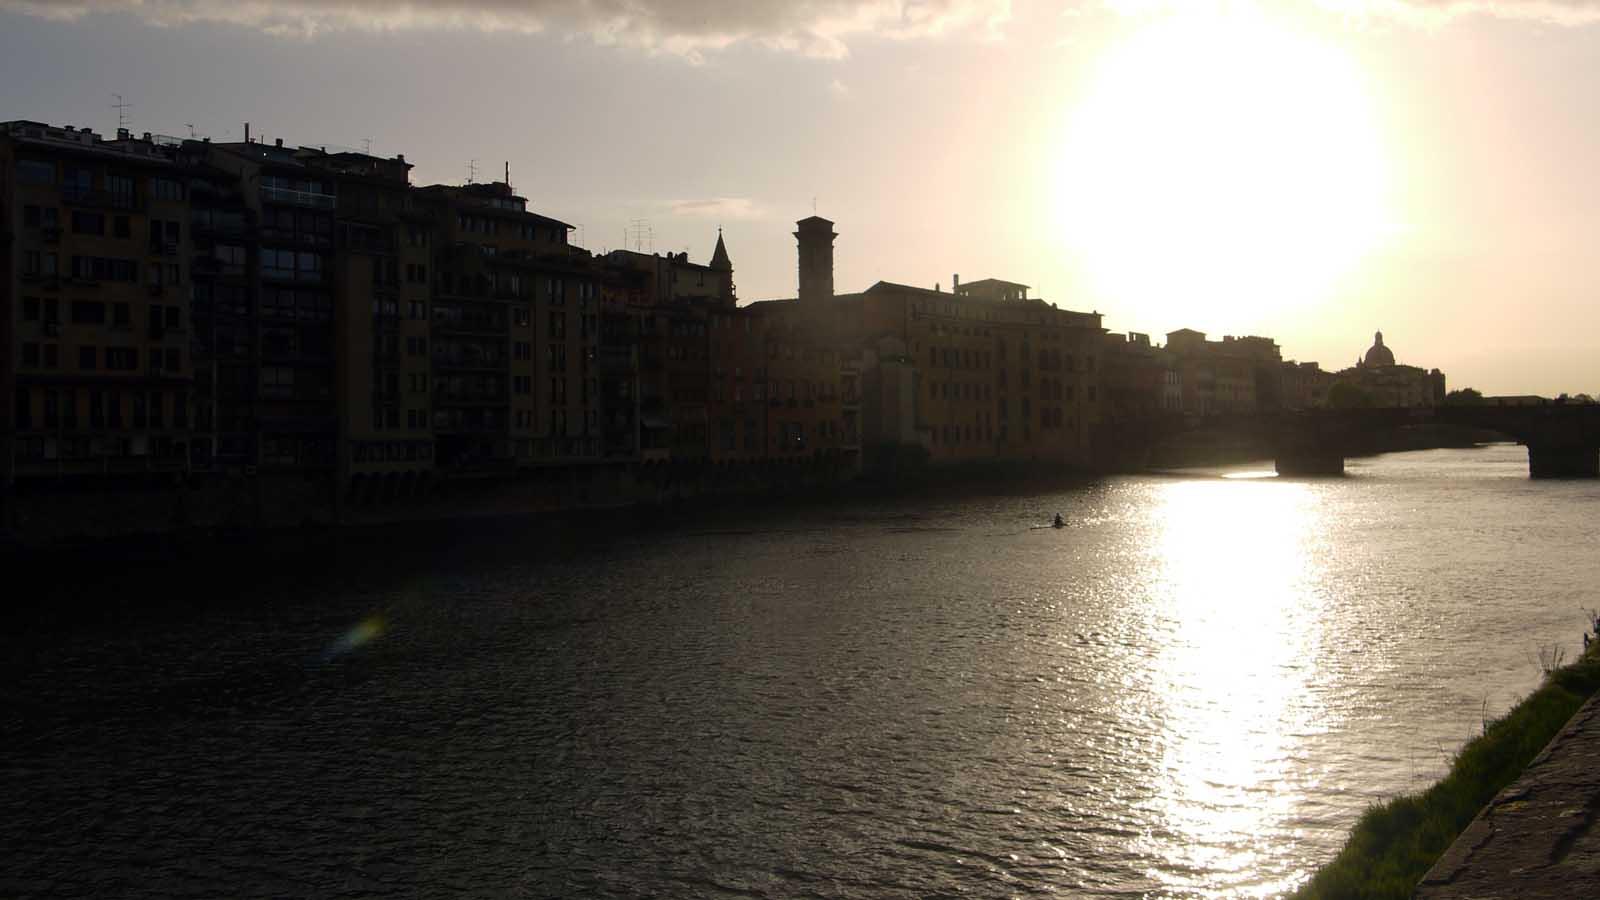 firenze-2013-339.jpg